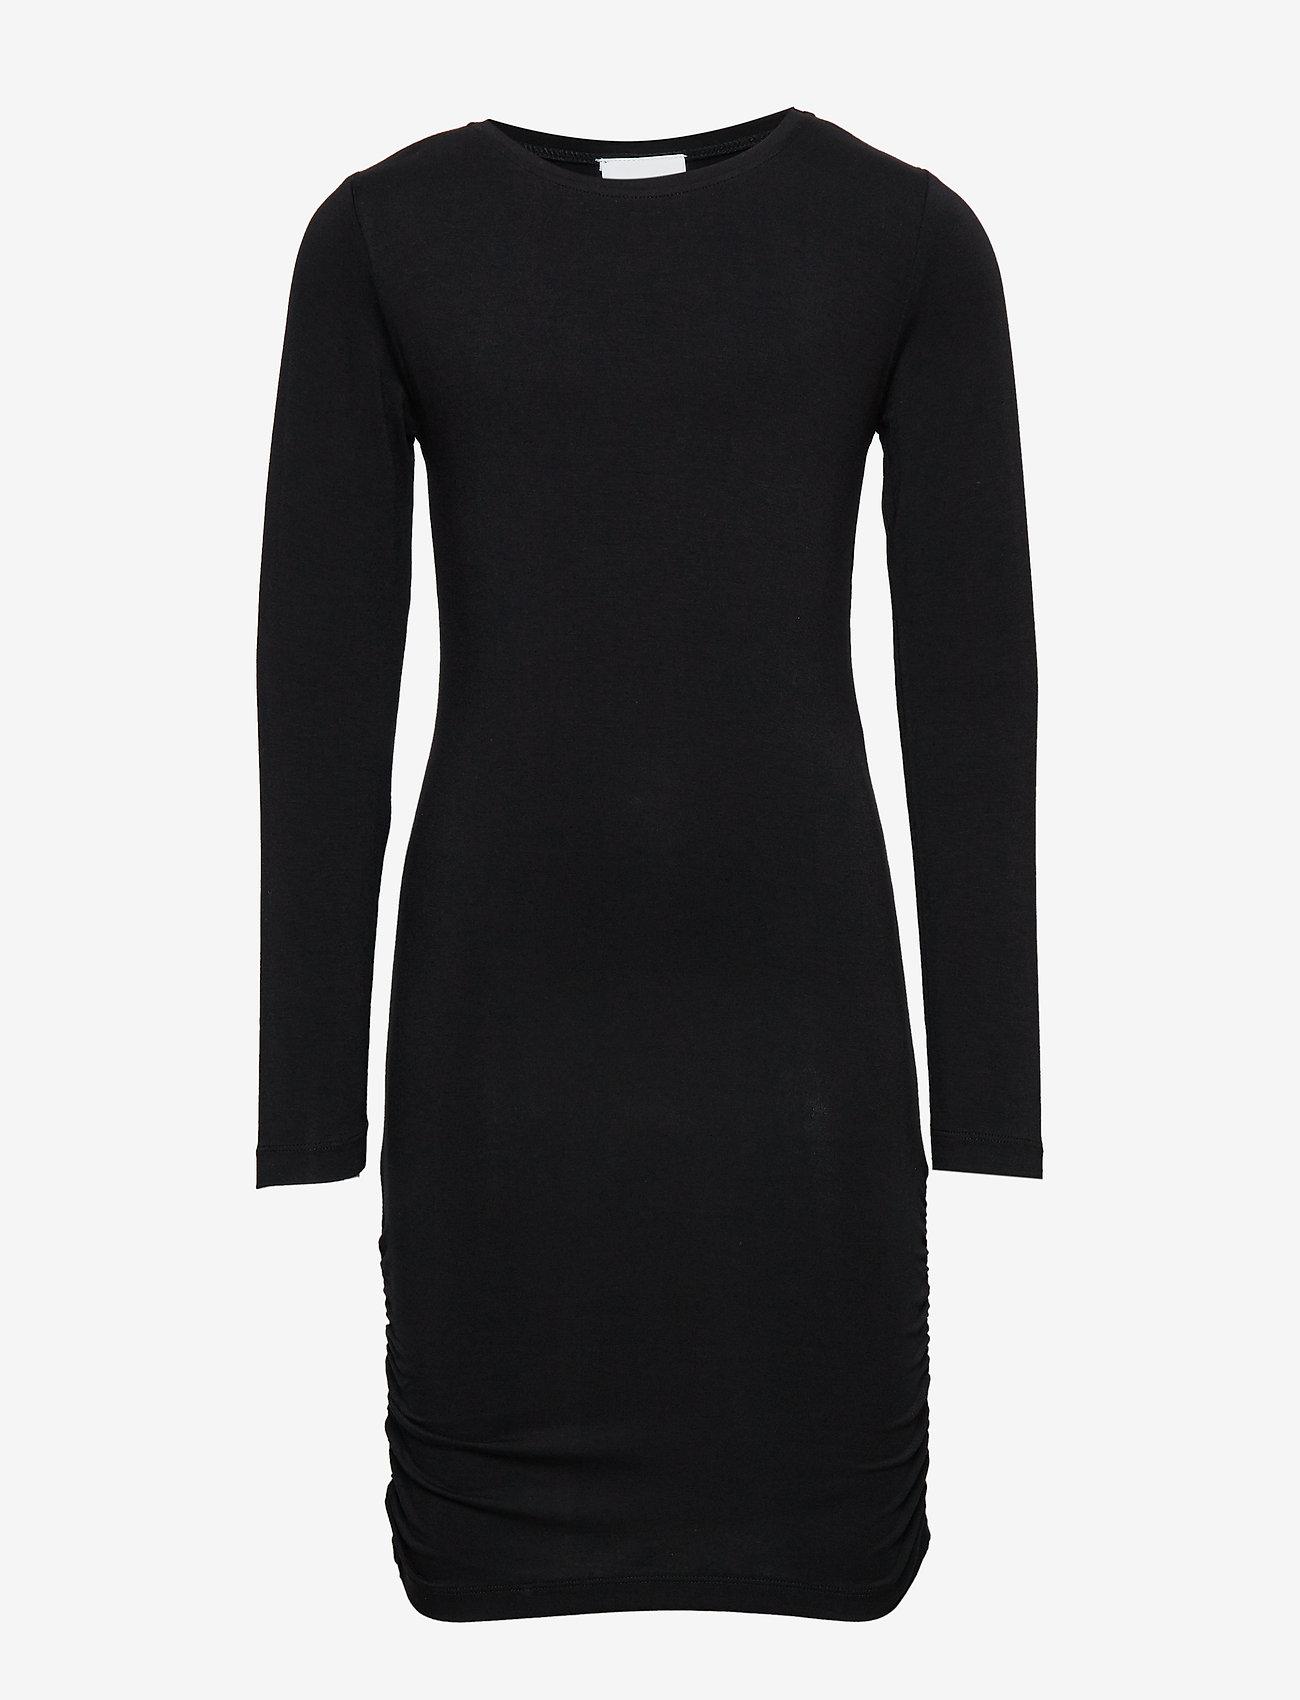 The New - ANUKA L_S DRESS - kleider - black - 0